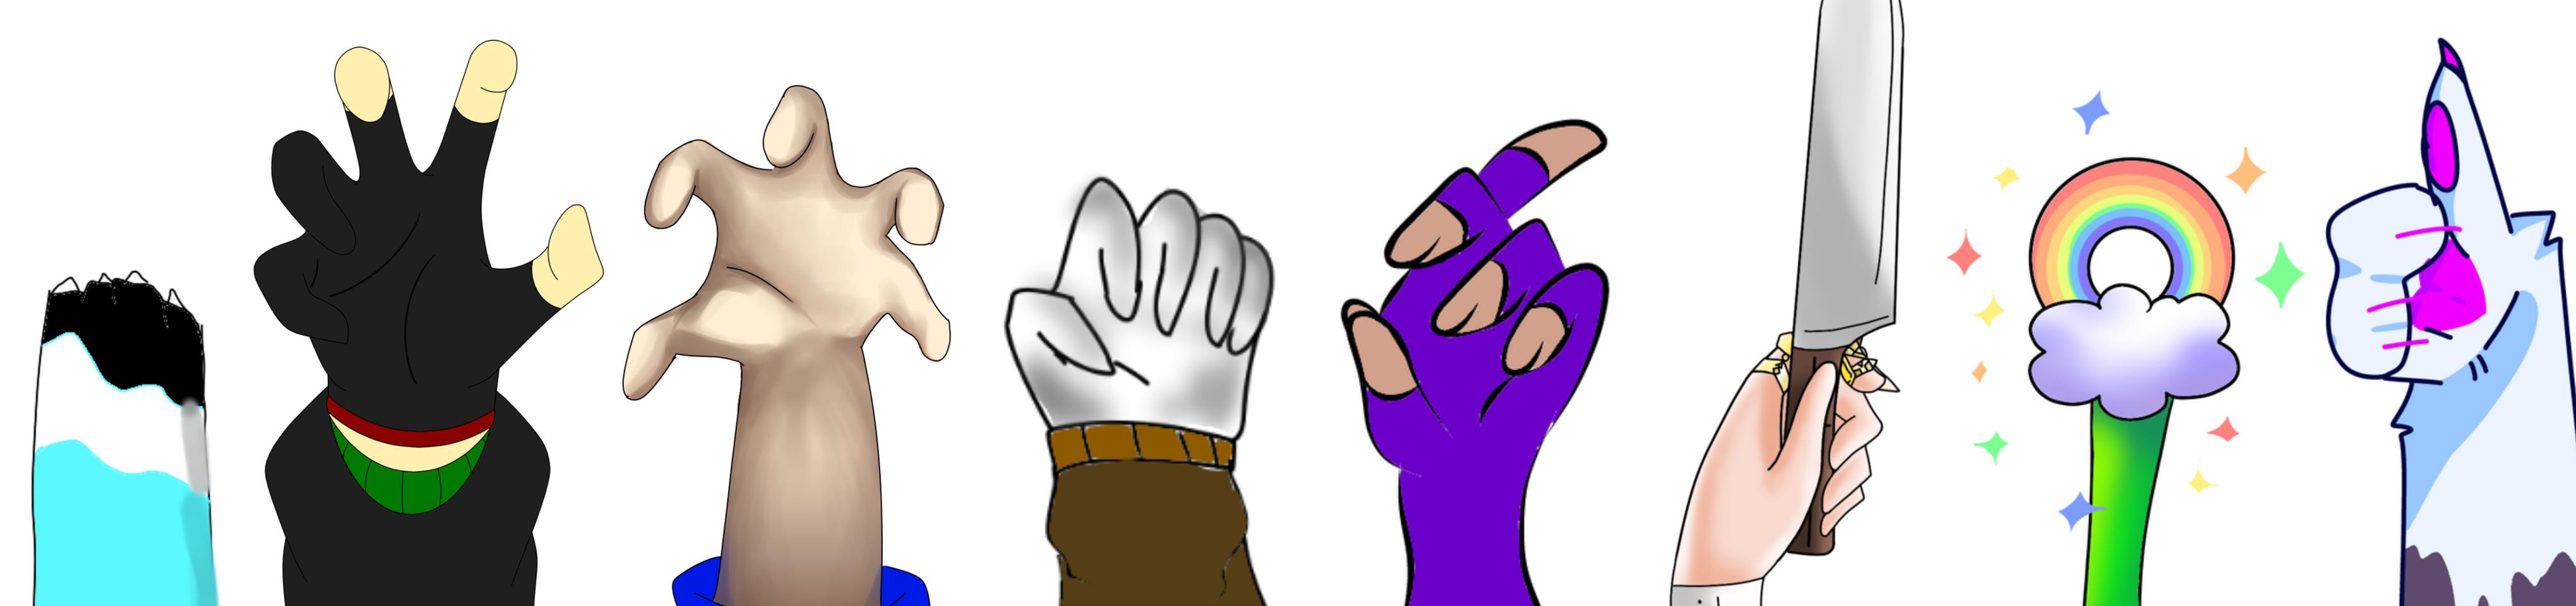 Collab with friends ! Illust of ฿₳ⱠĐł ฿₳ⱠĐł₥ØⱤɆ medibangpaint